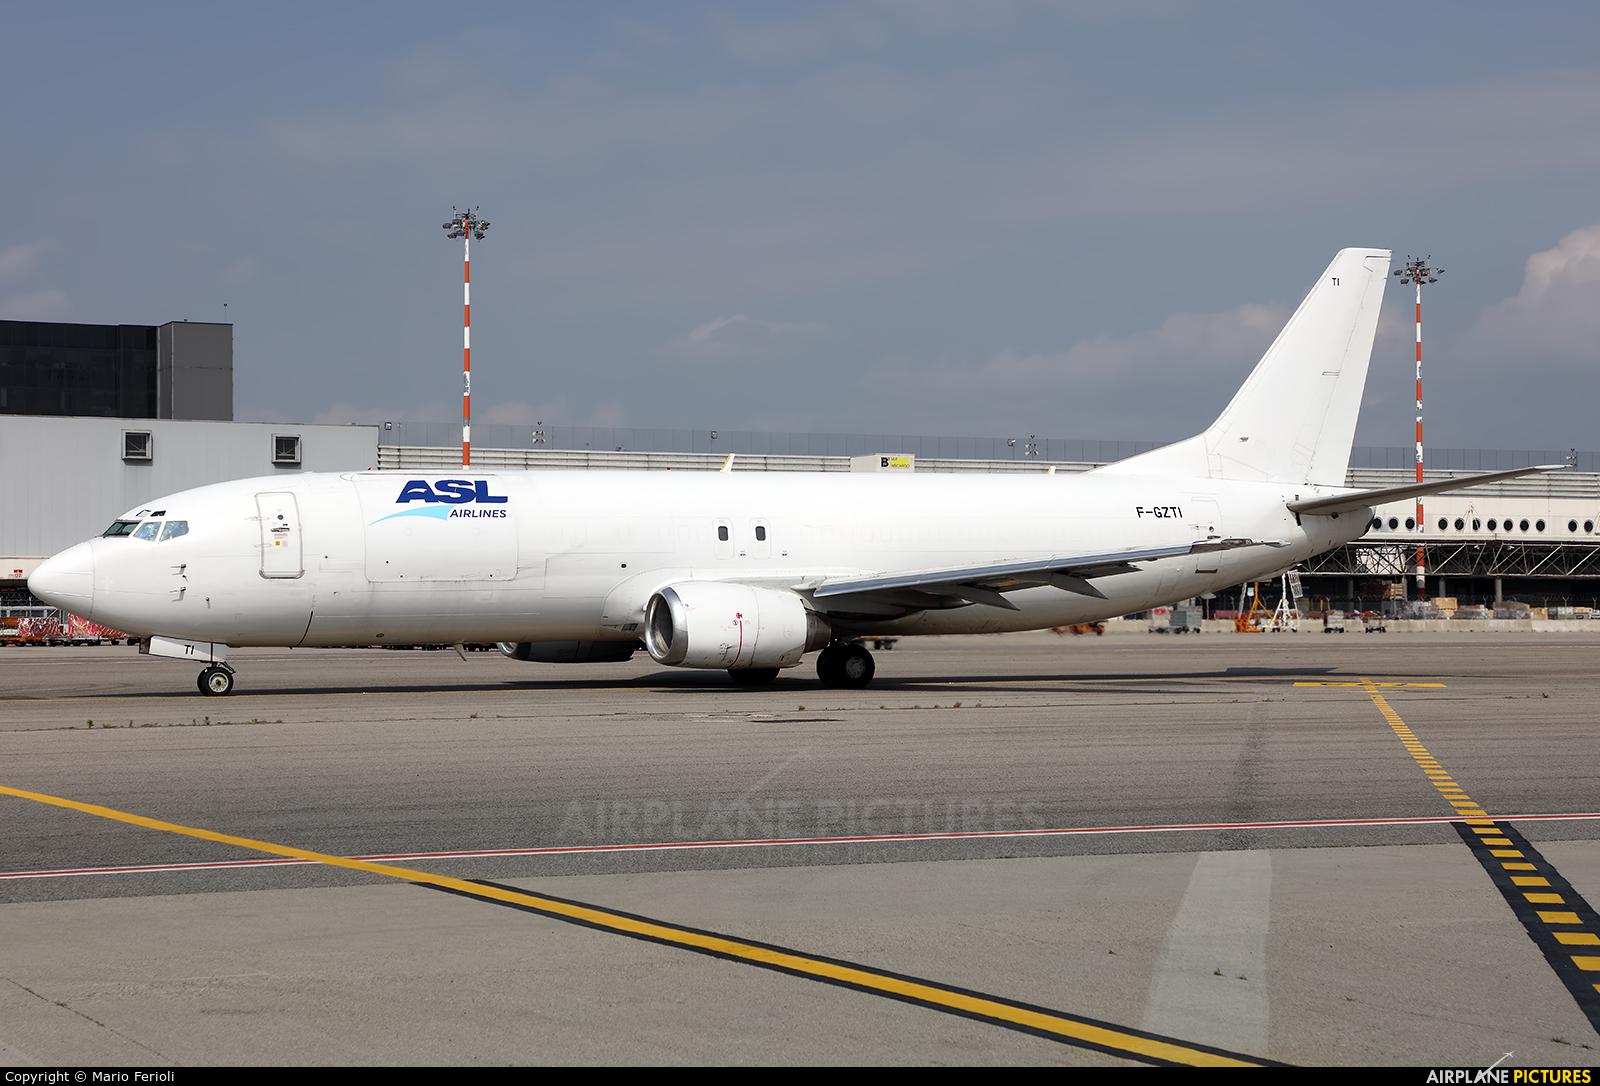 ASL Airlines F-GZTI aircraft at Milan - Malpensa